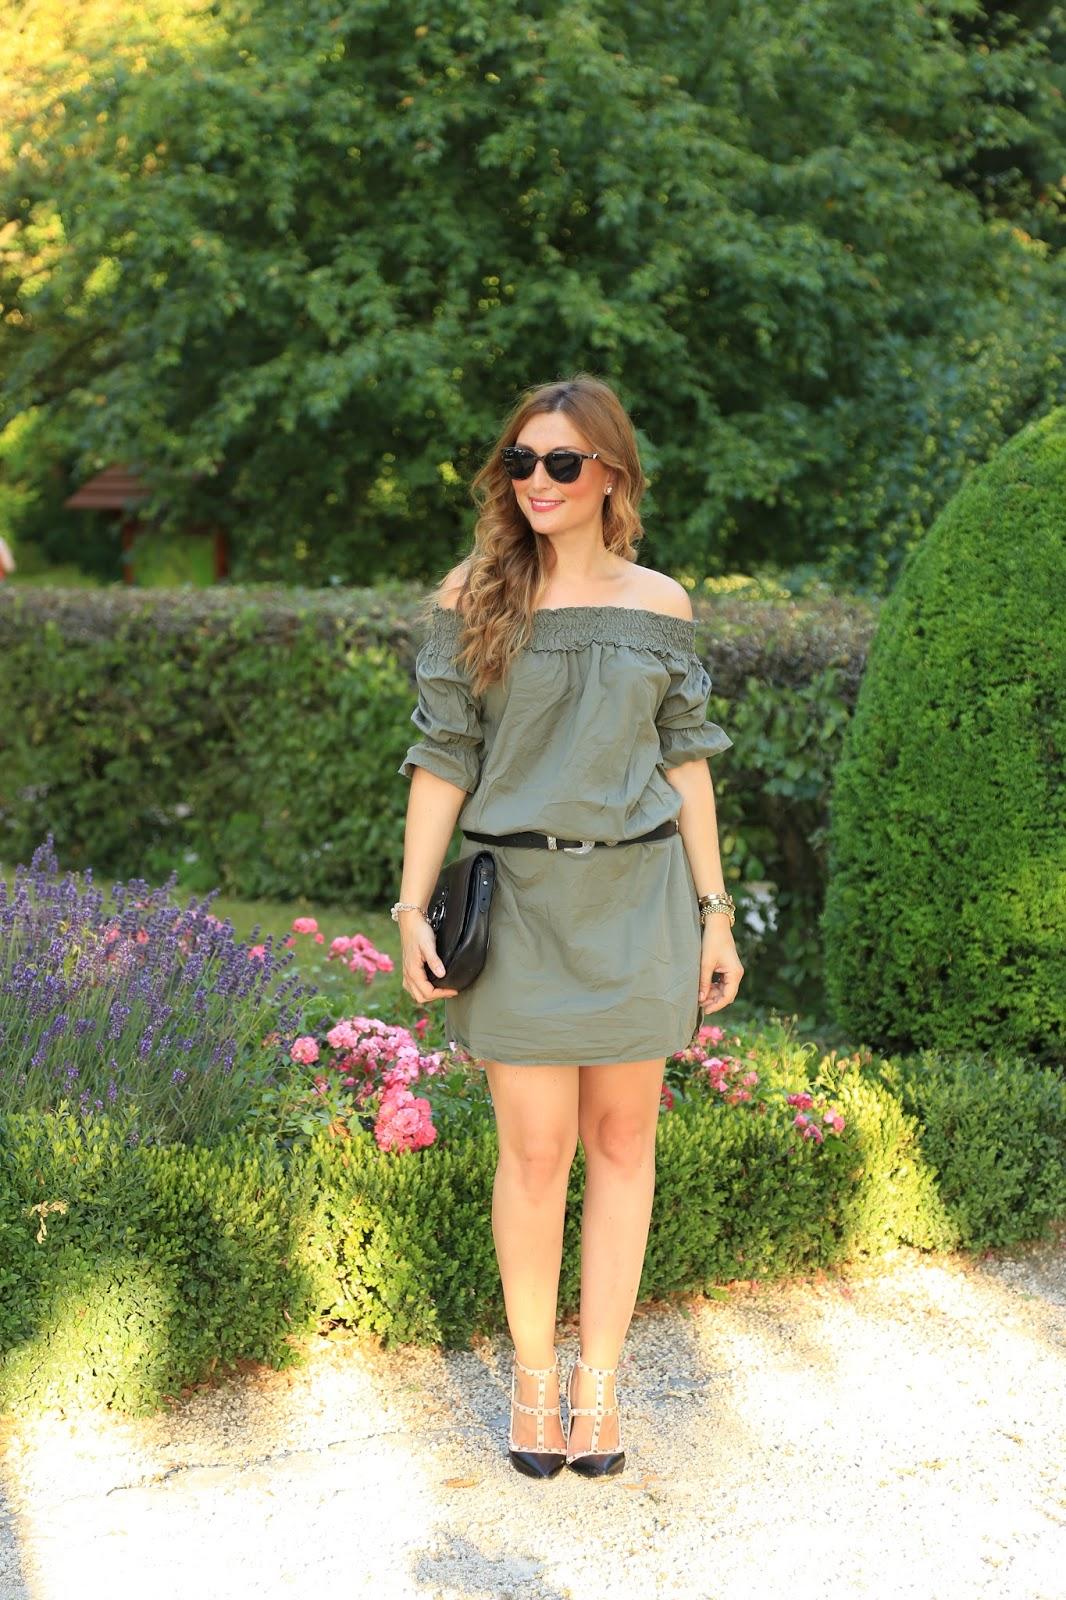 Fashionstylebyjohanna - Fashionblogger aus Frankfurt - Carmenkleid - Khaki Kleid